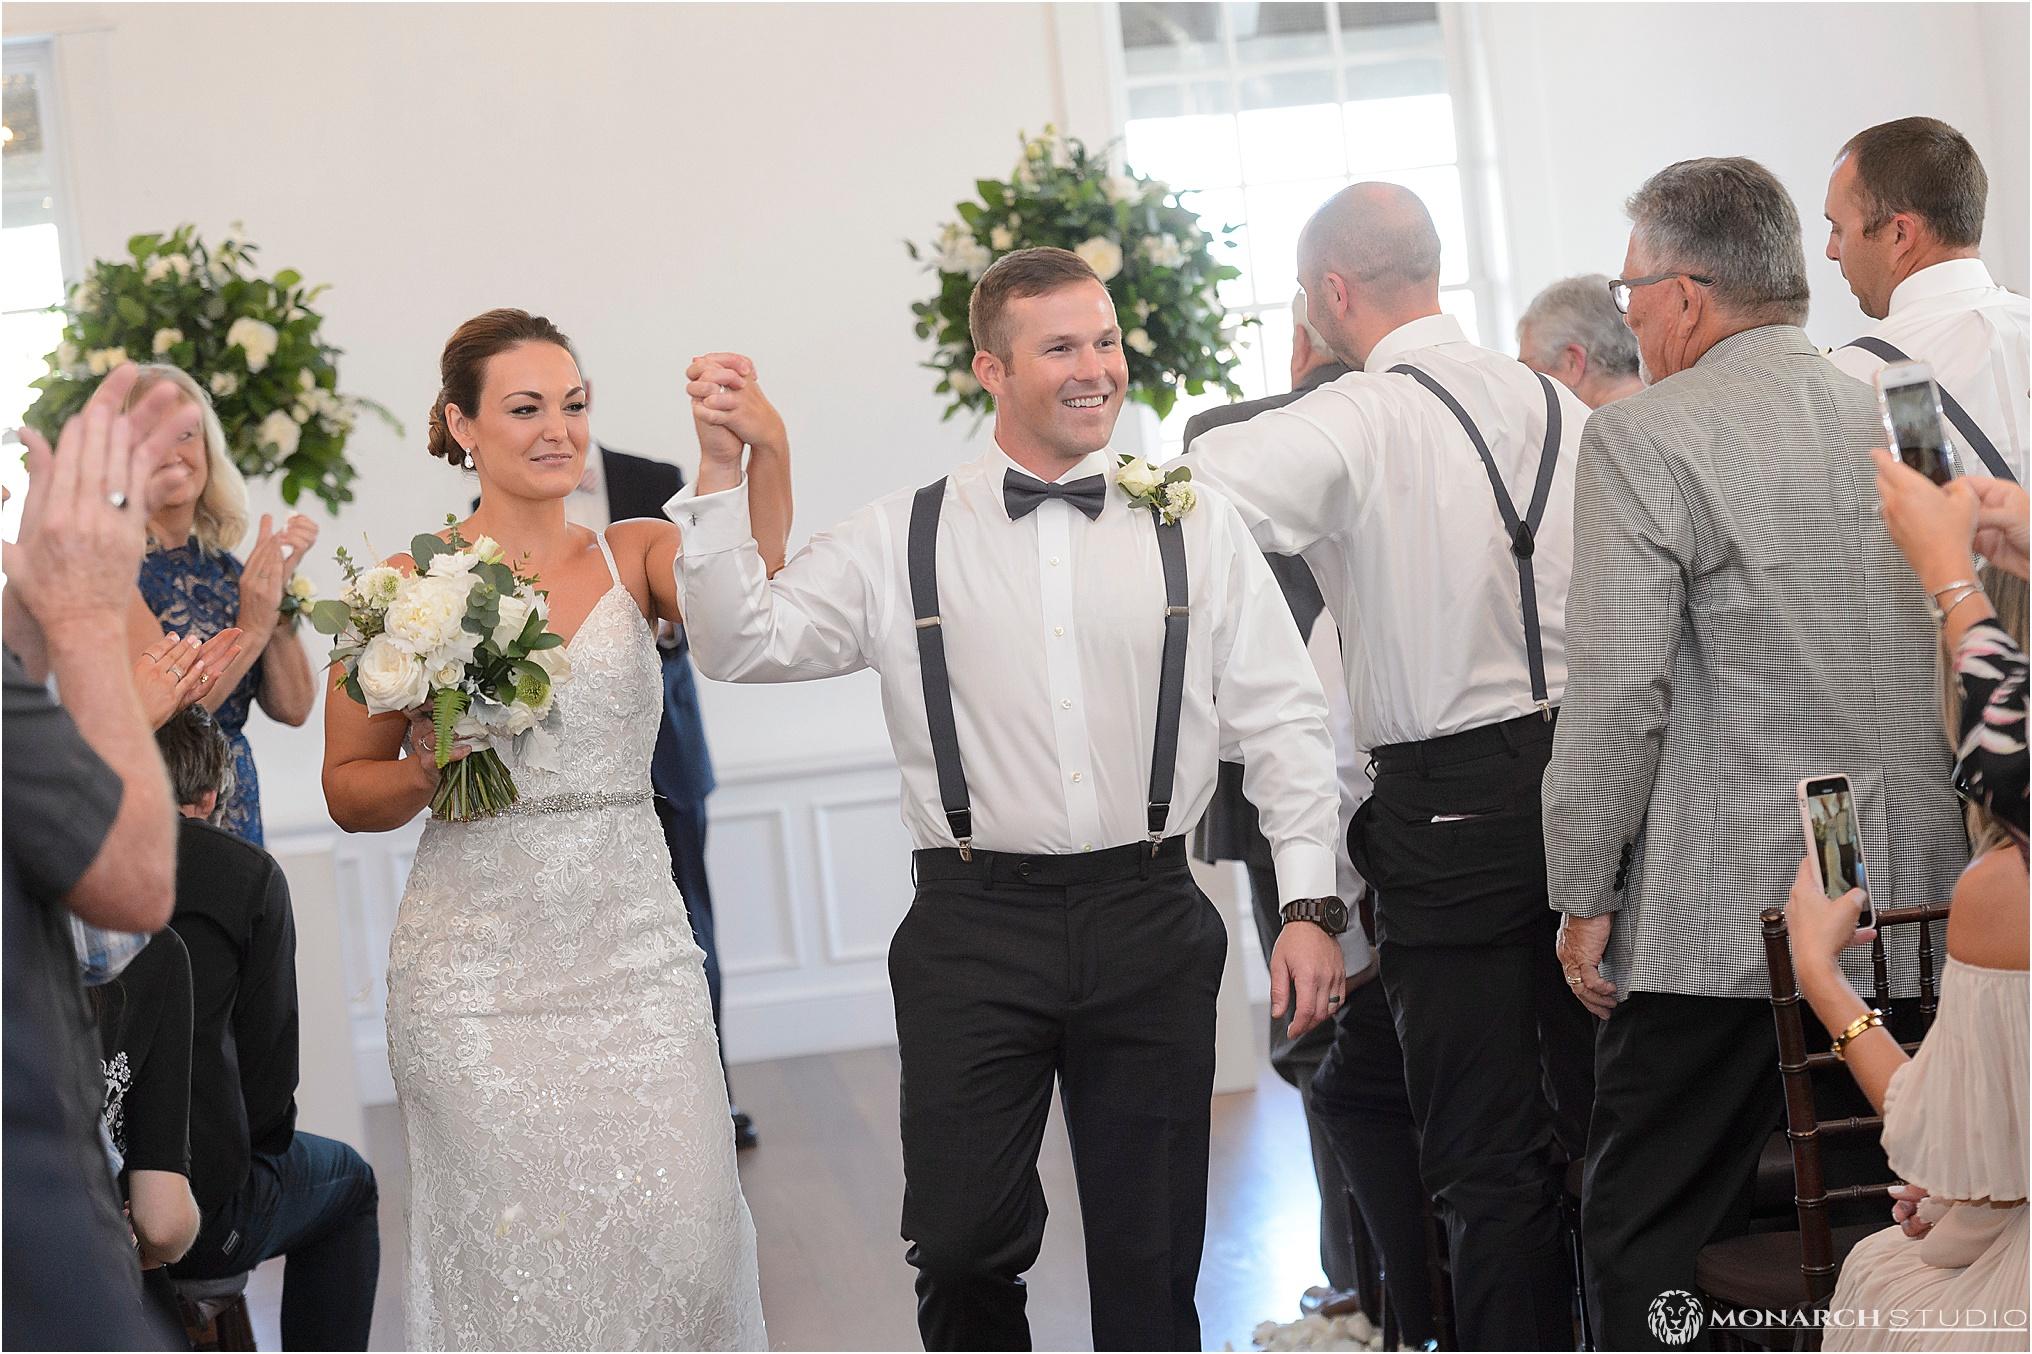 080-whiteroom-wedding-photographer-2019-05-22_0062.jpg